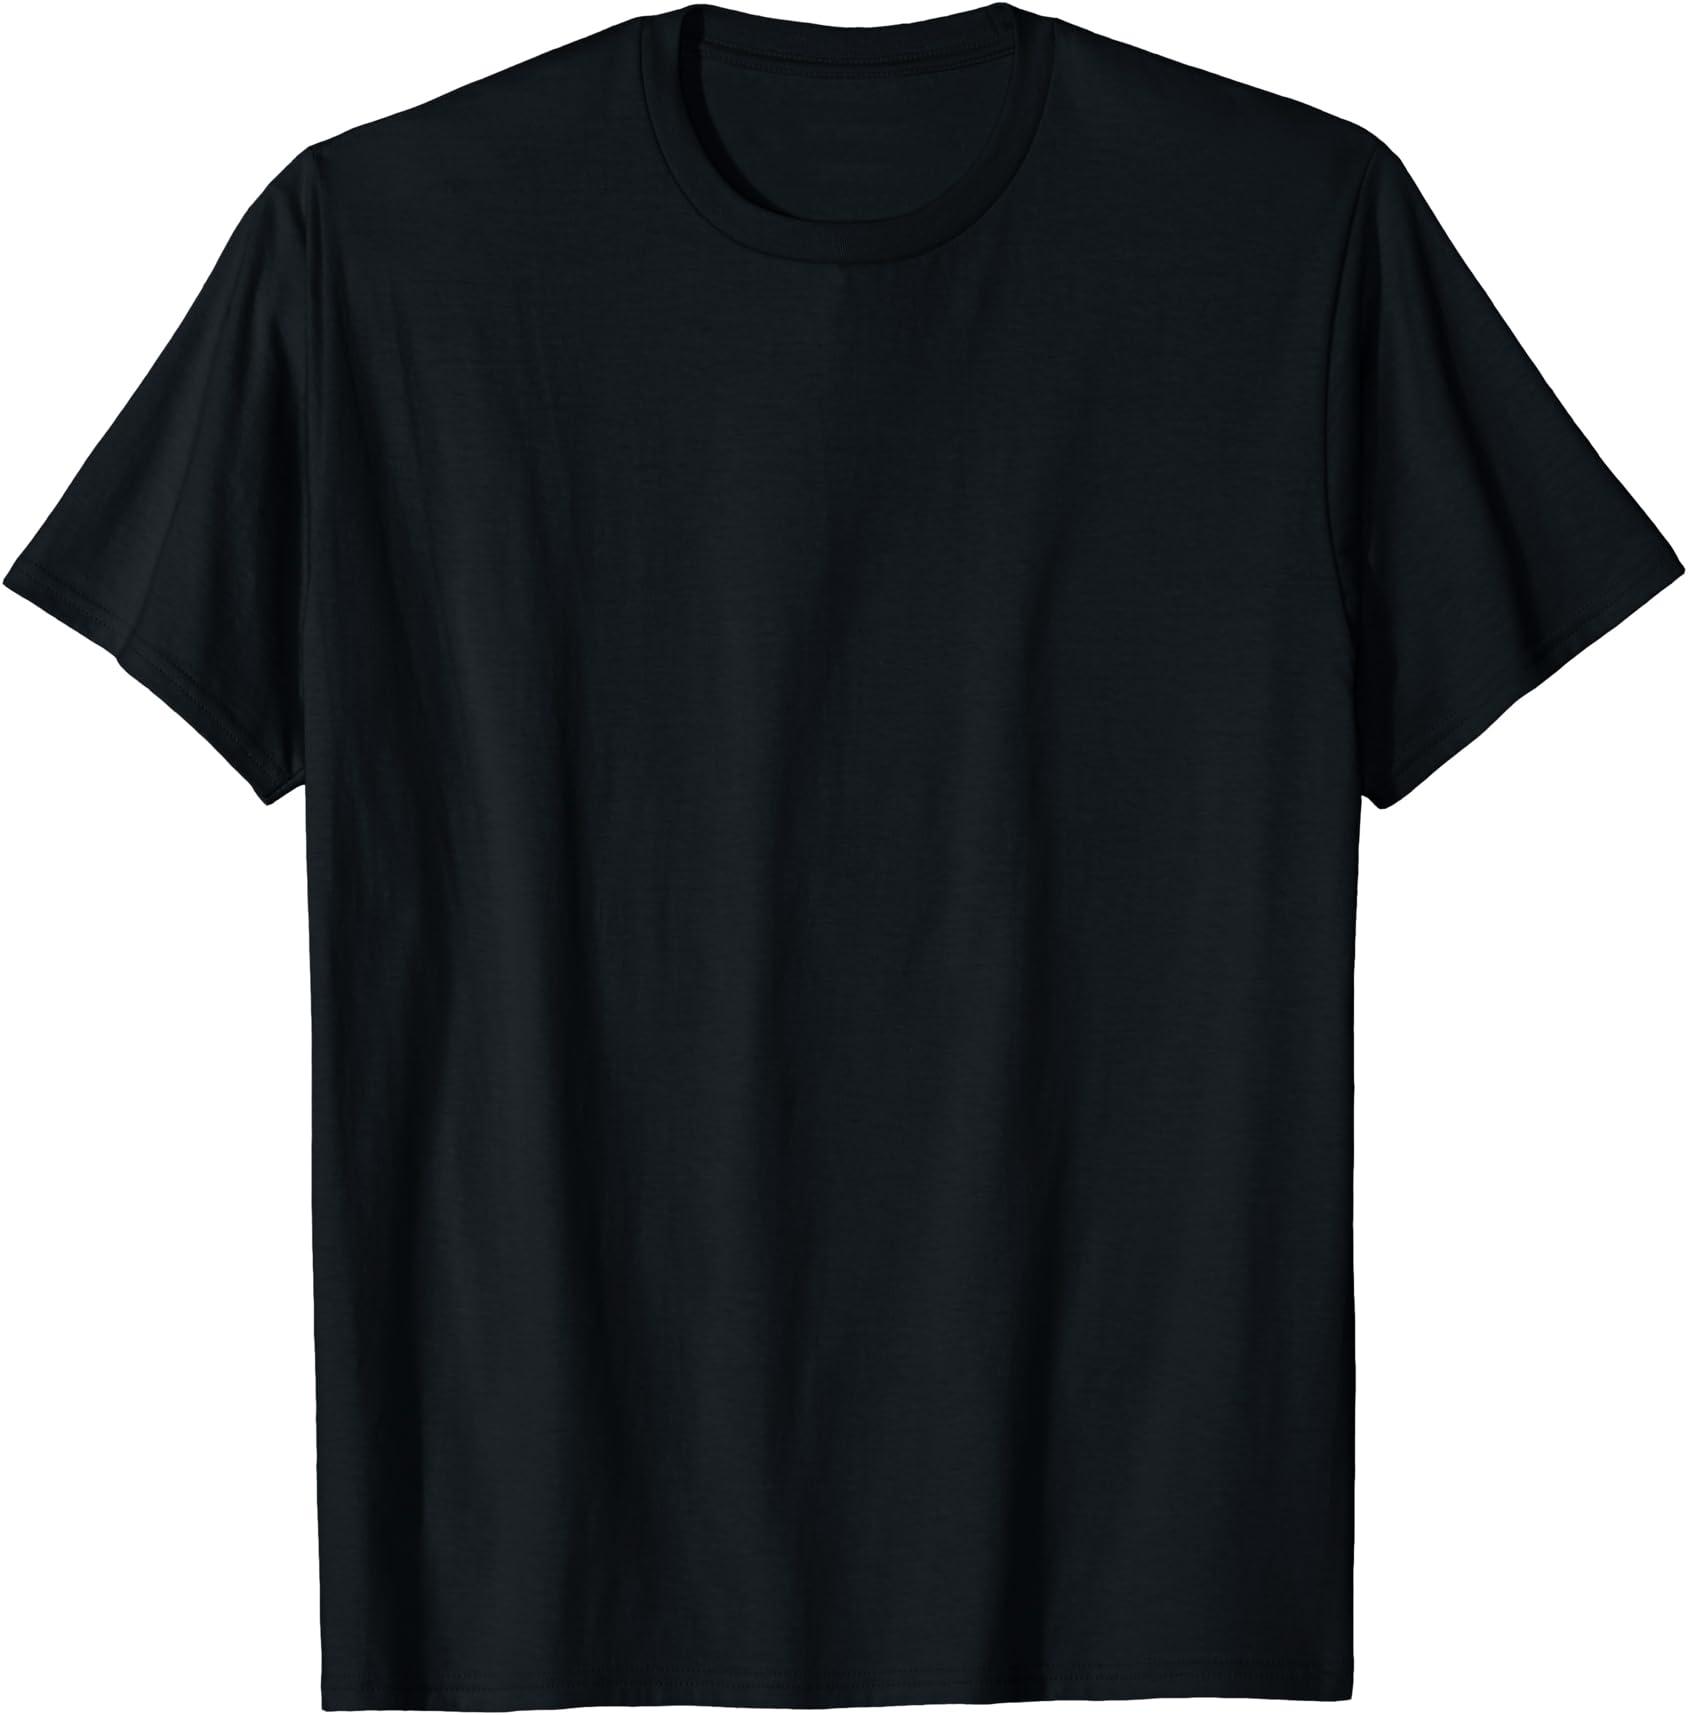 Donald Trump Merica USA Flag T-Shirt 4th of July Memorial Day Shirt Trump 2020 T-Shirt